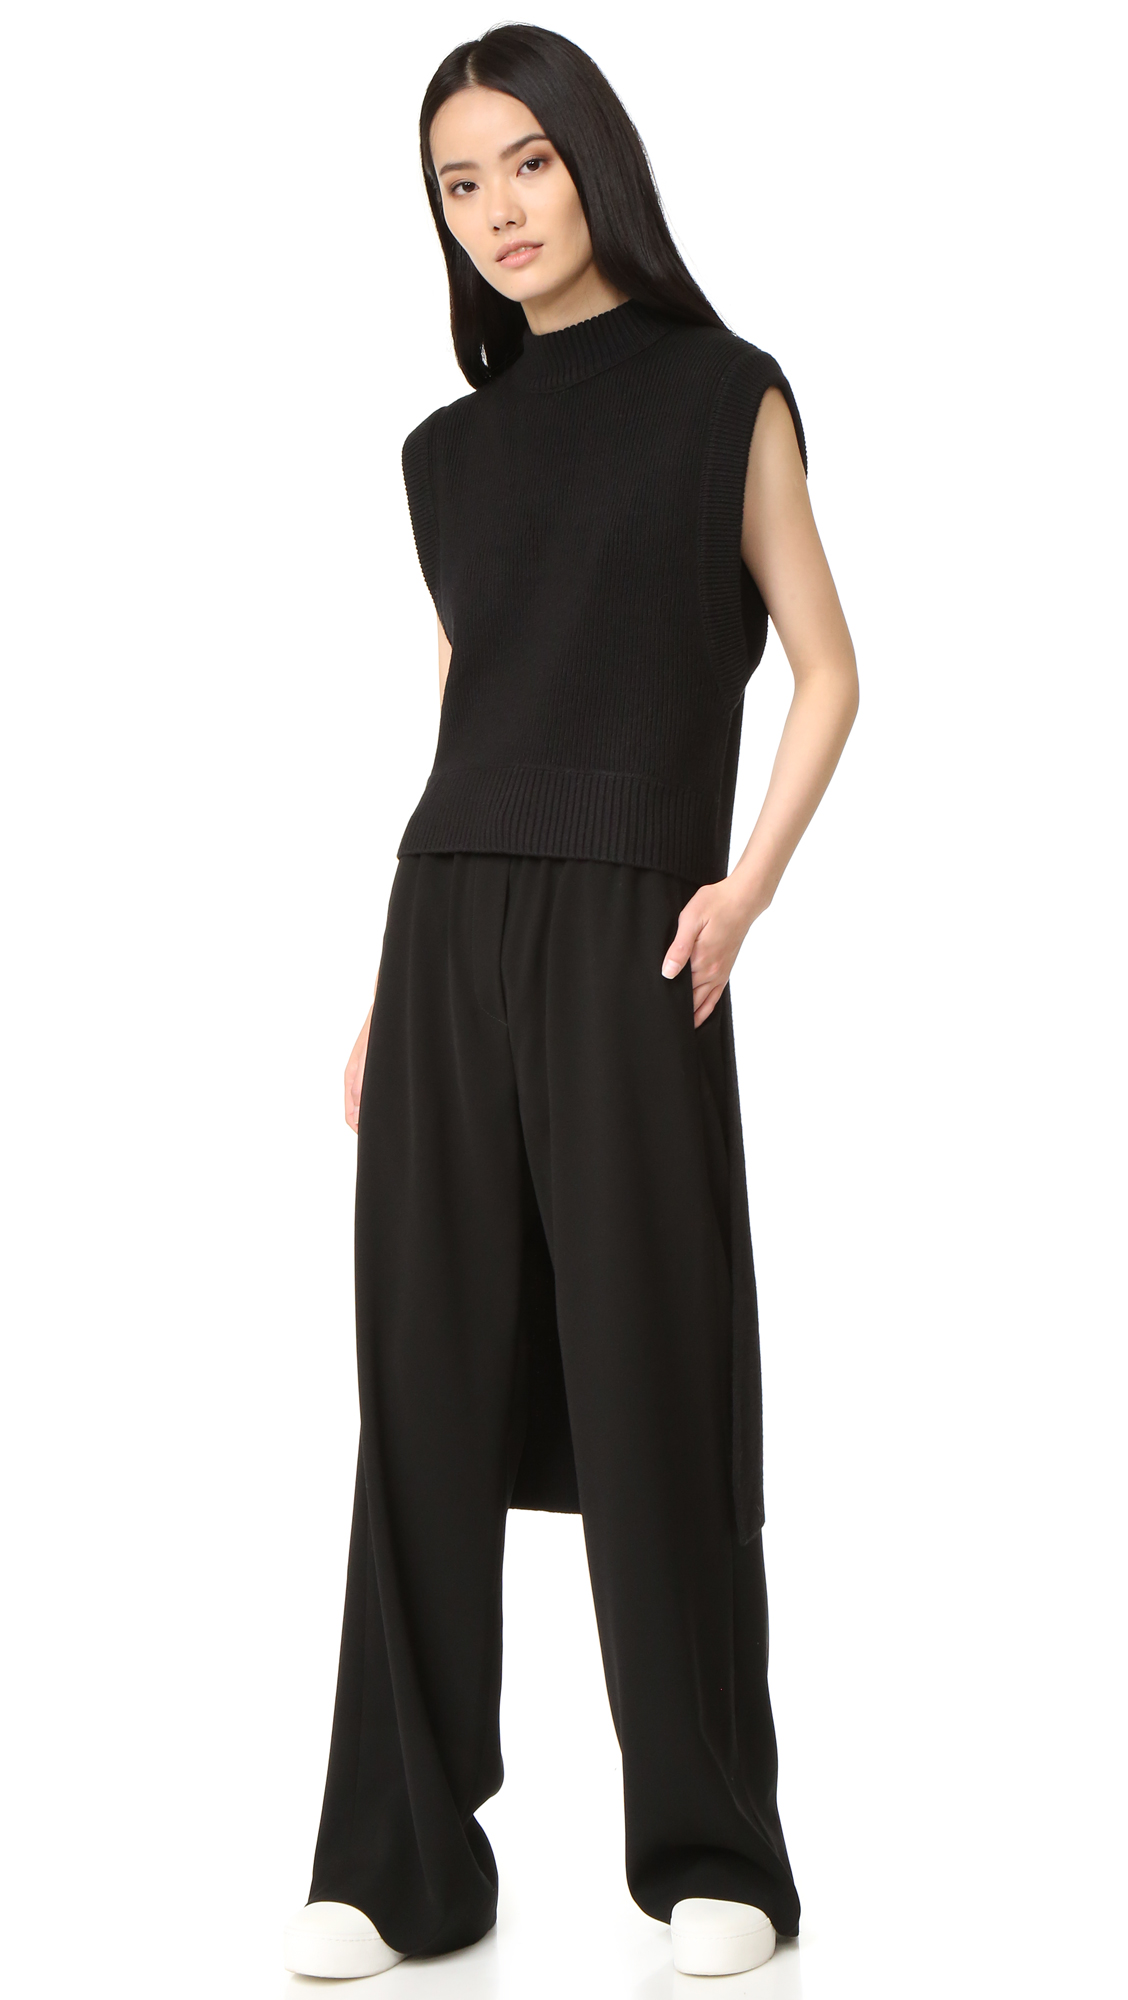 Dkny Crew Neck Sweater With Extra Long Hem - Black at Shopbop